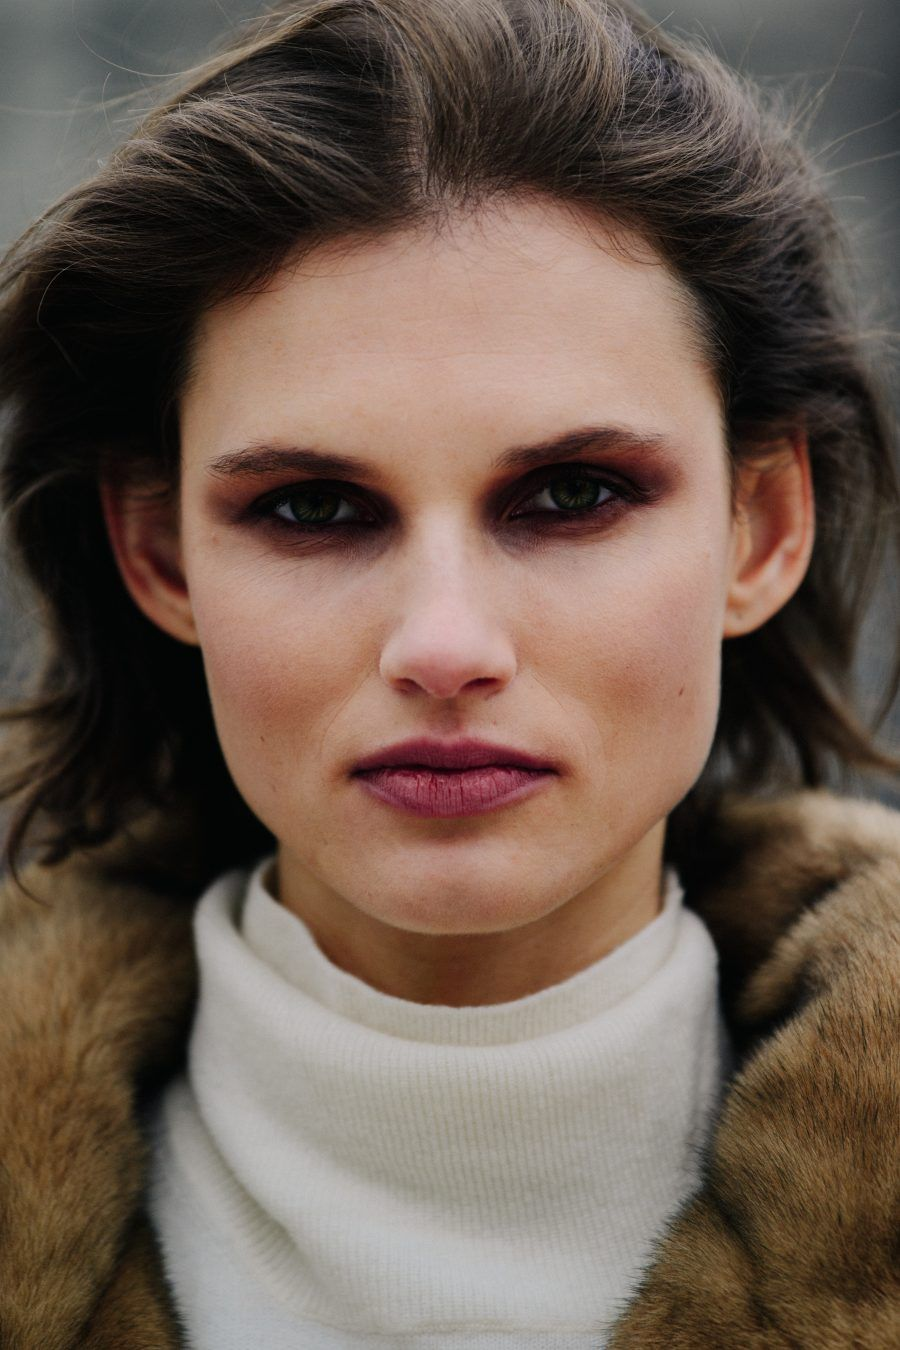 No makeup makeup. Photo by Kate Benson. Model is Eliza